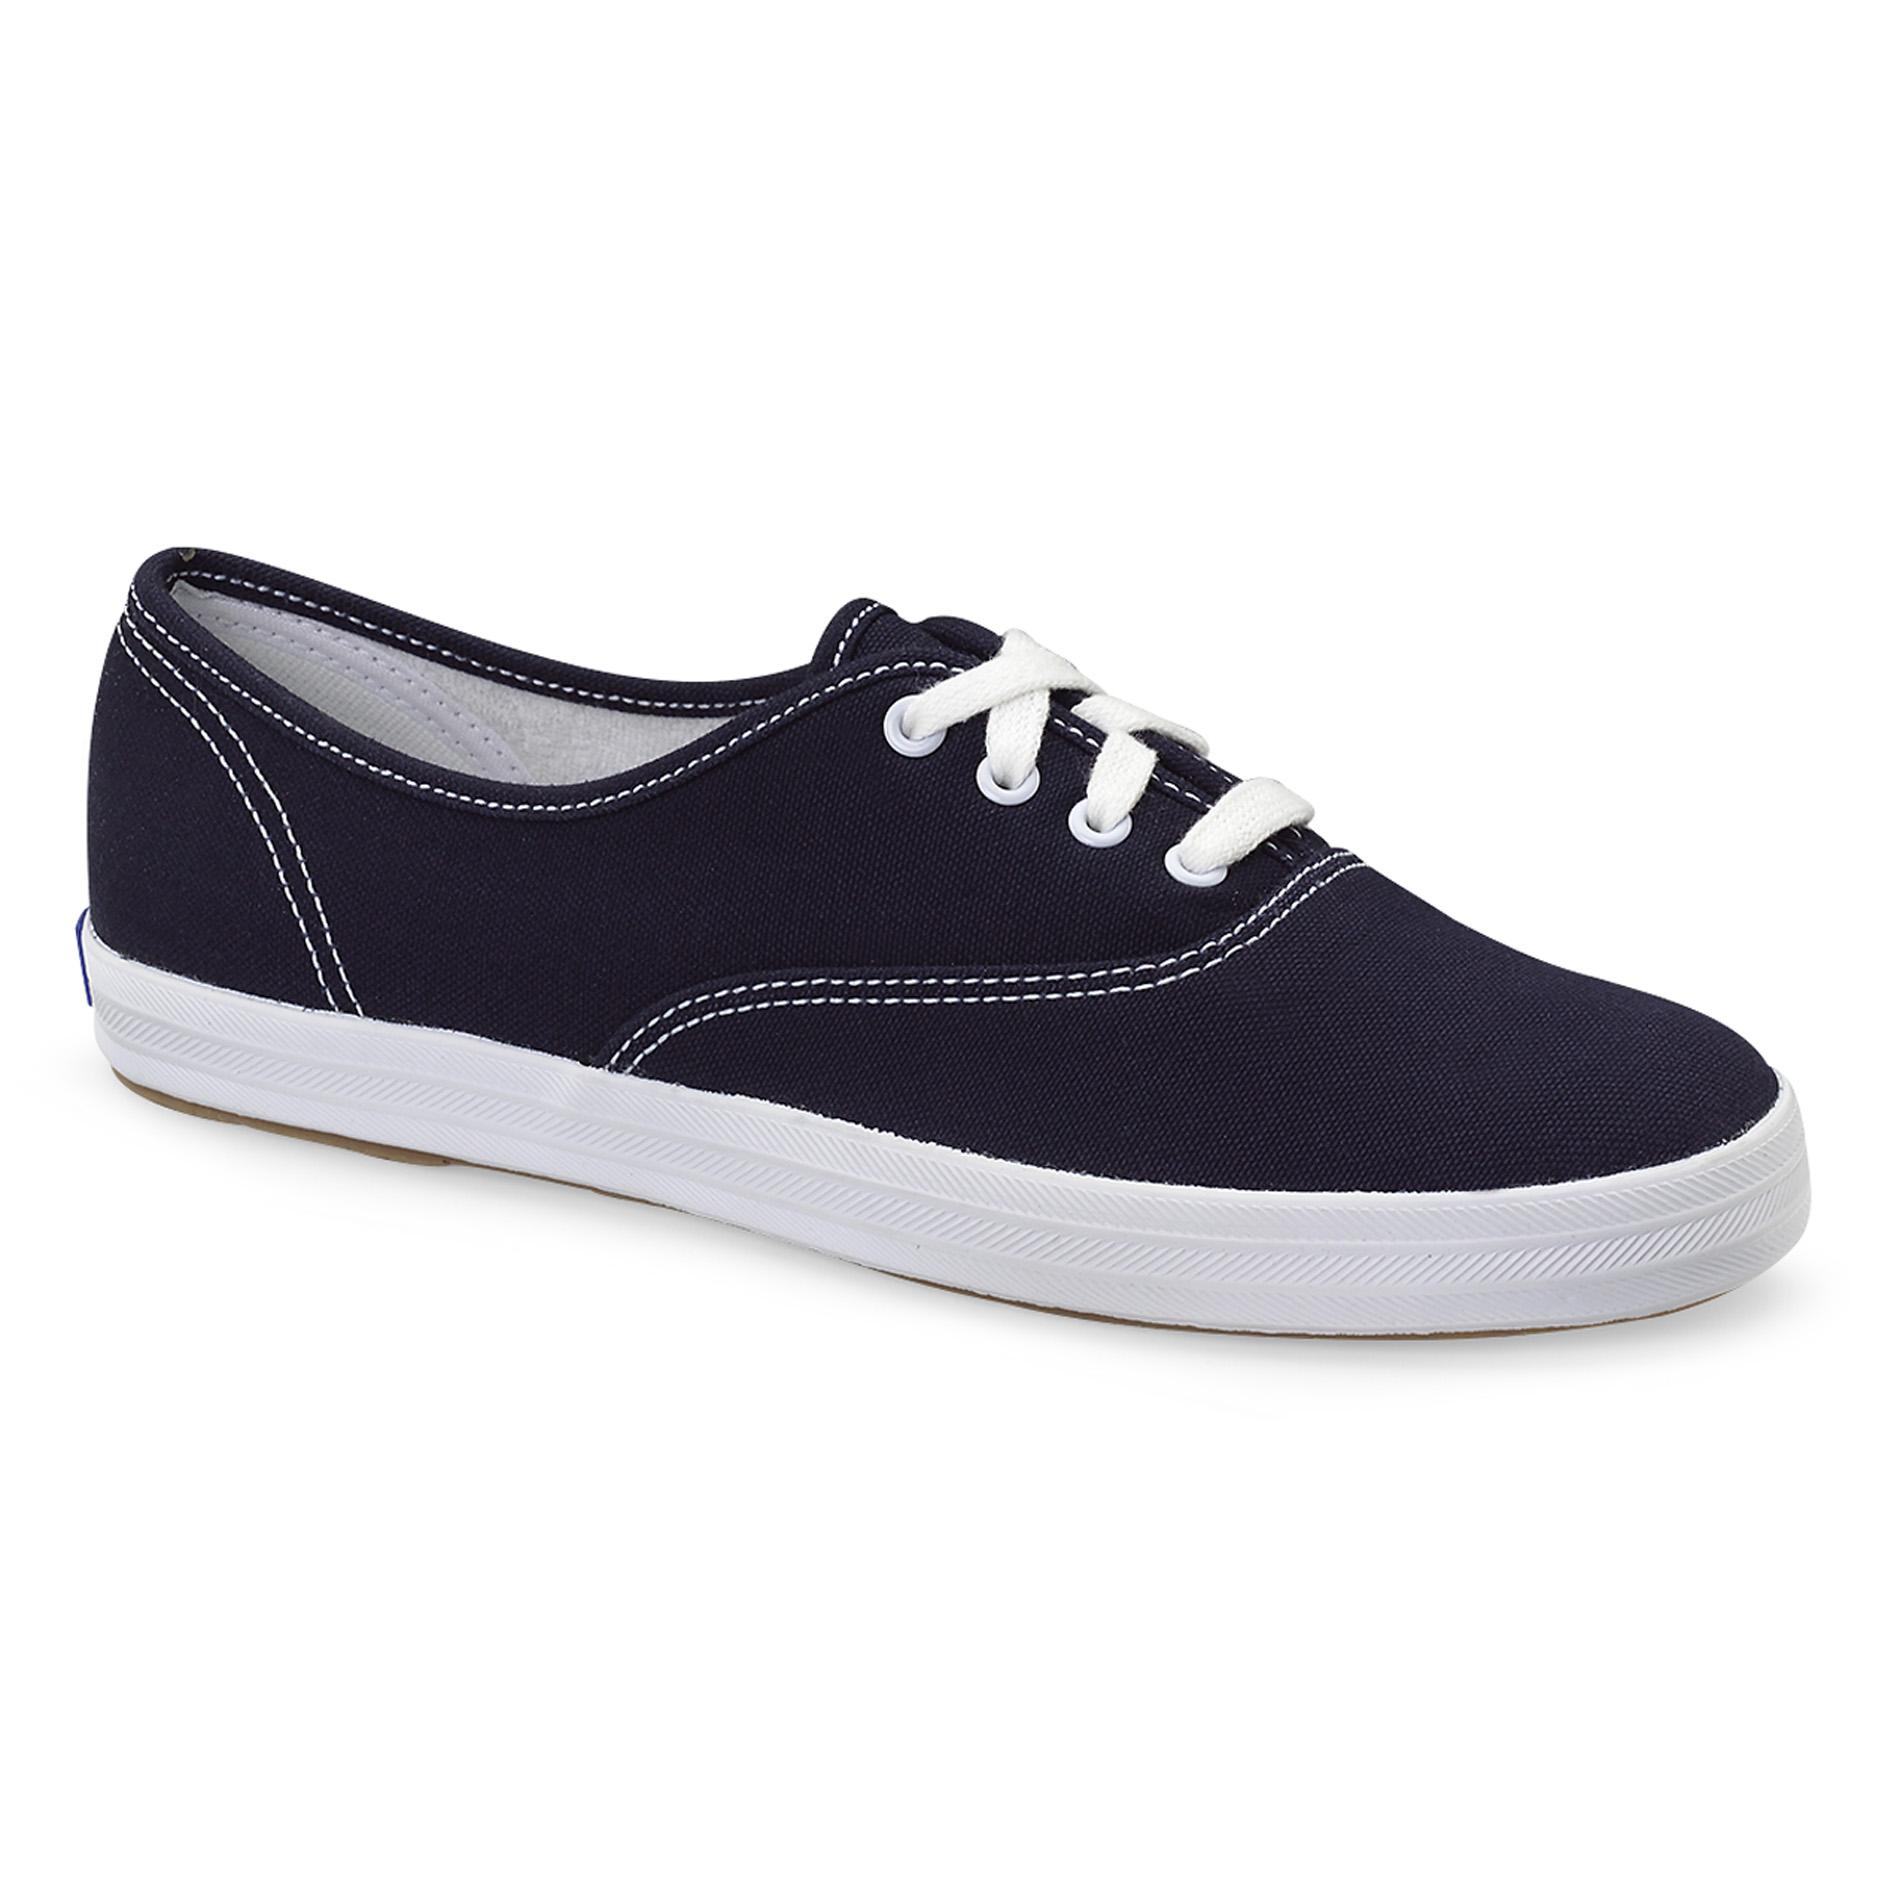 1150e2ca43692 UPC 044209486197 - Keds Women s Champion Originals Navy Sneaker ...